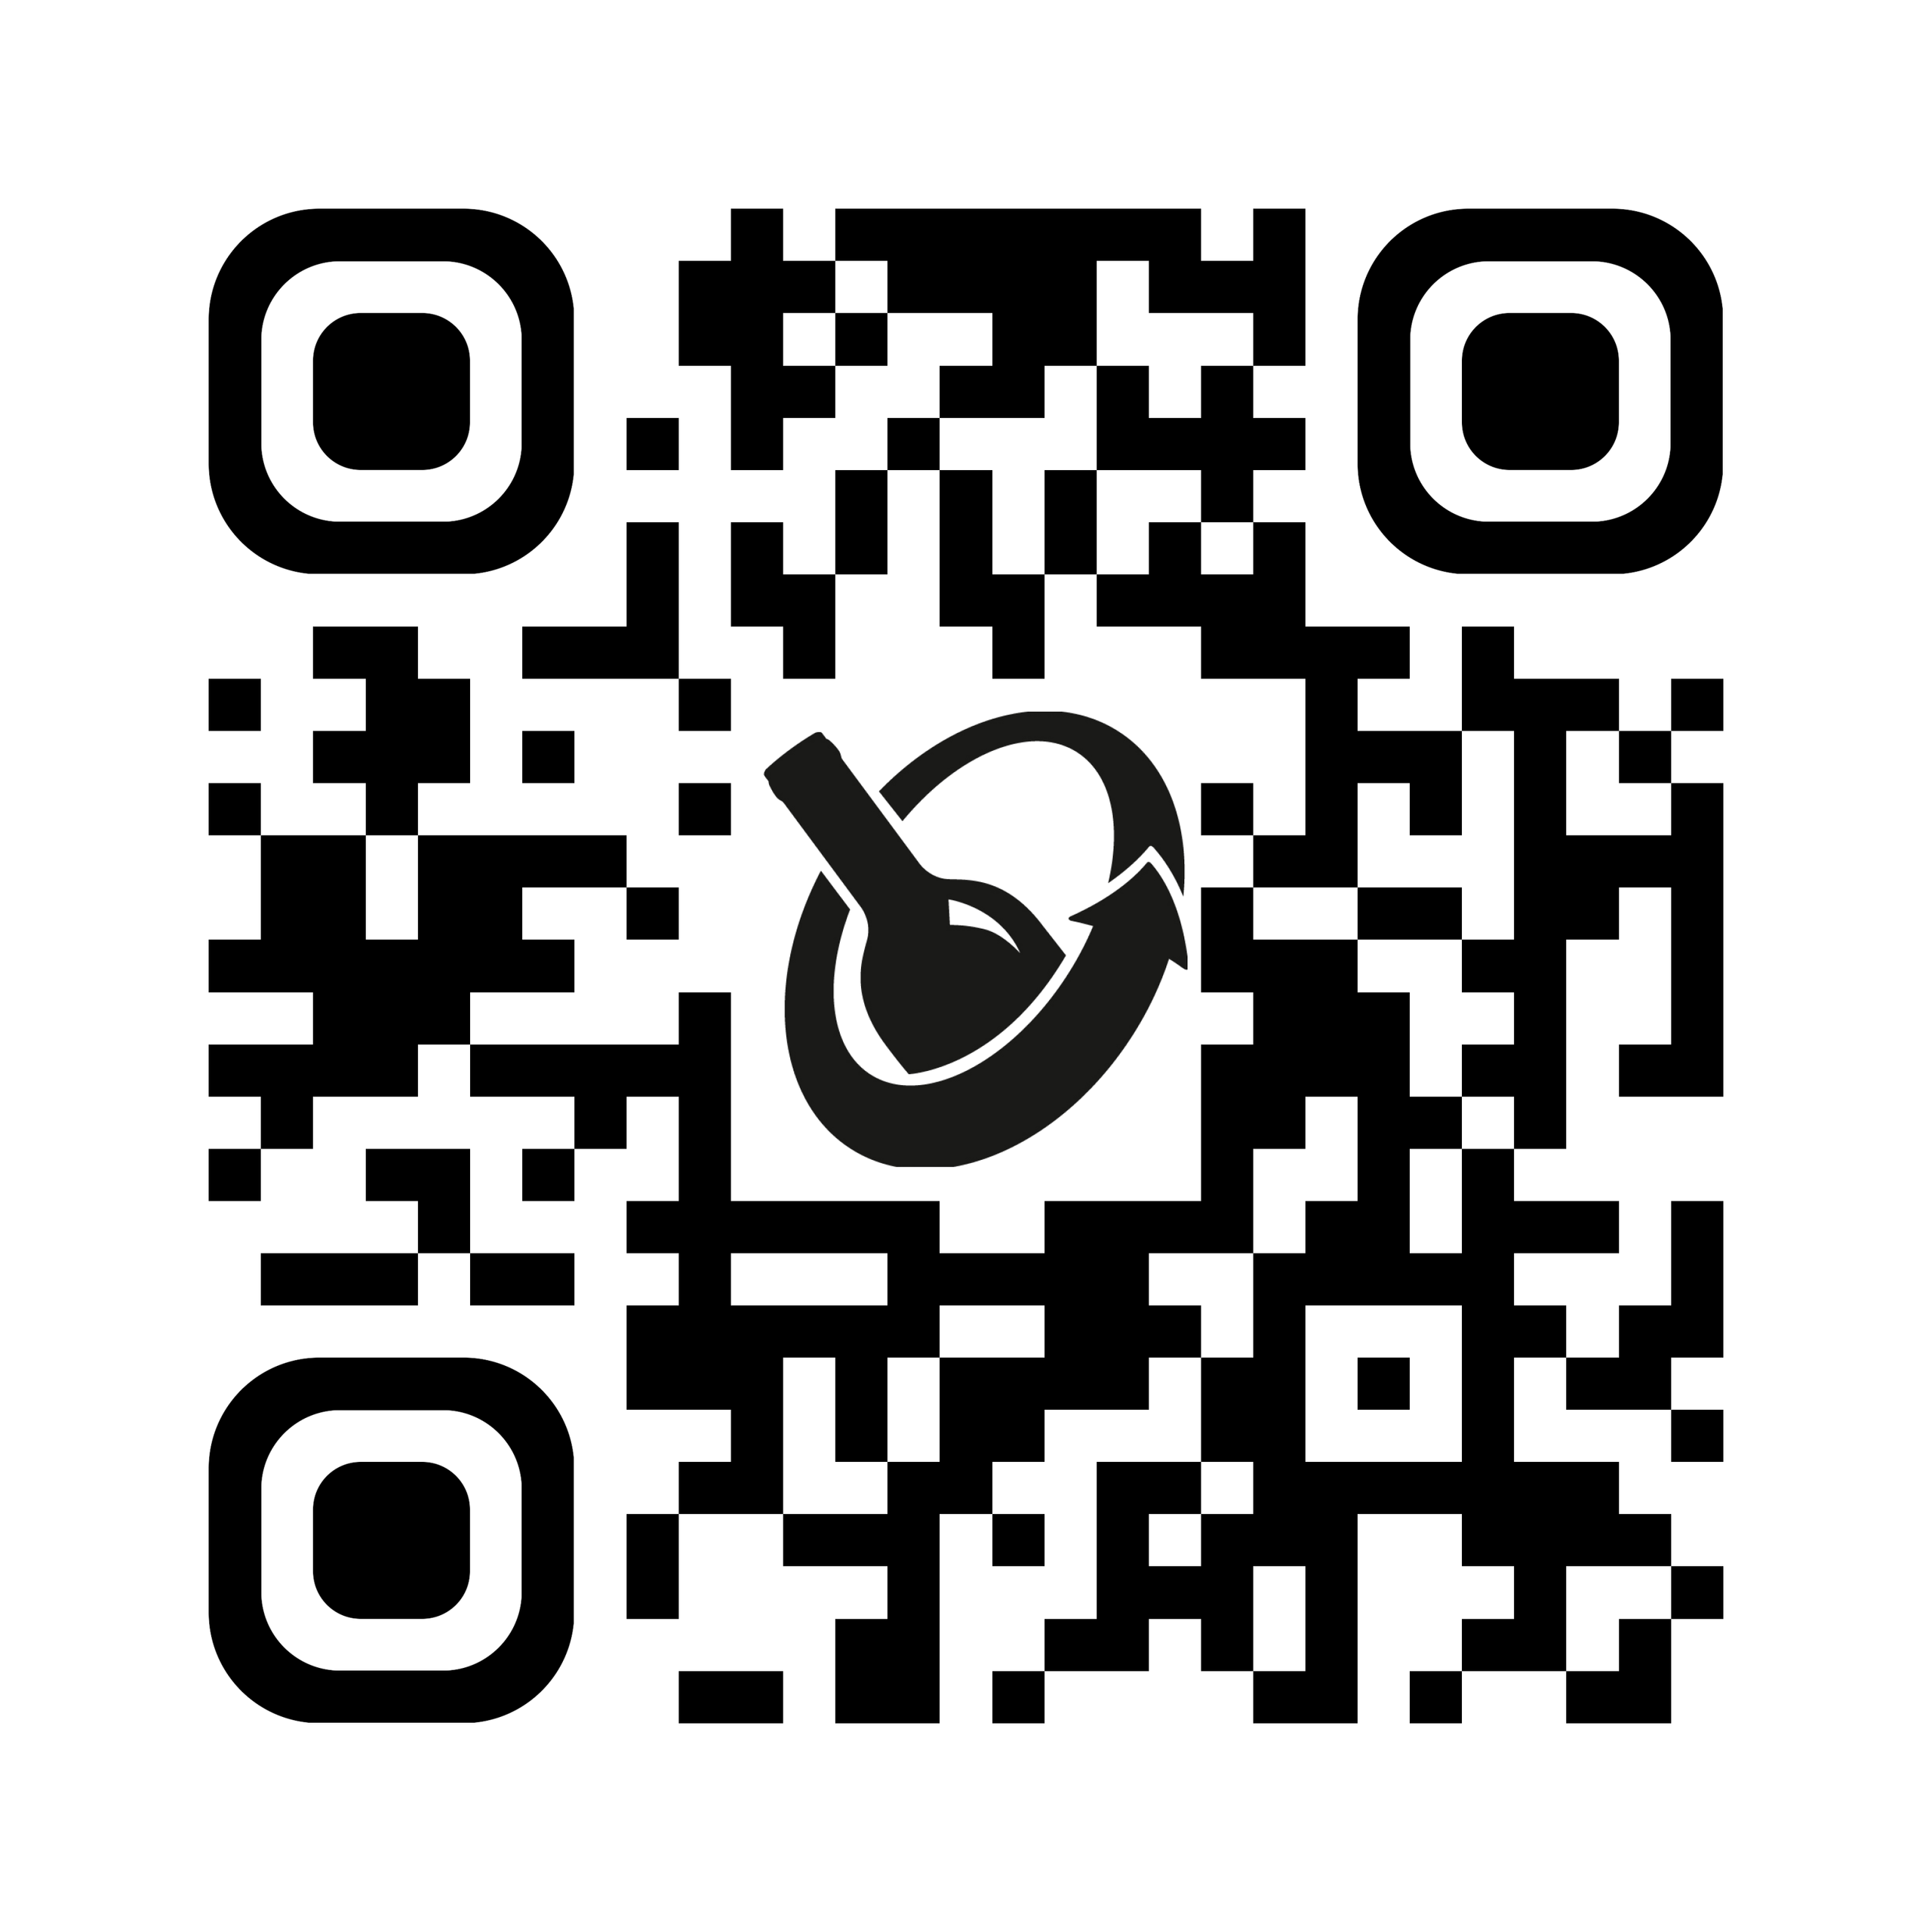 QR-Code glasartig App führt zu Google Play oder App store